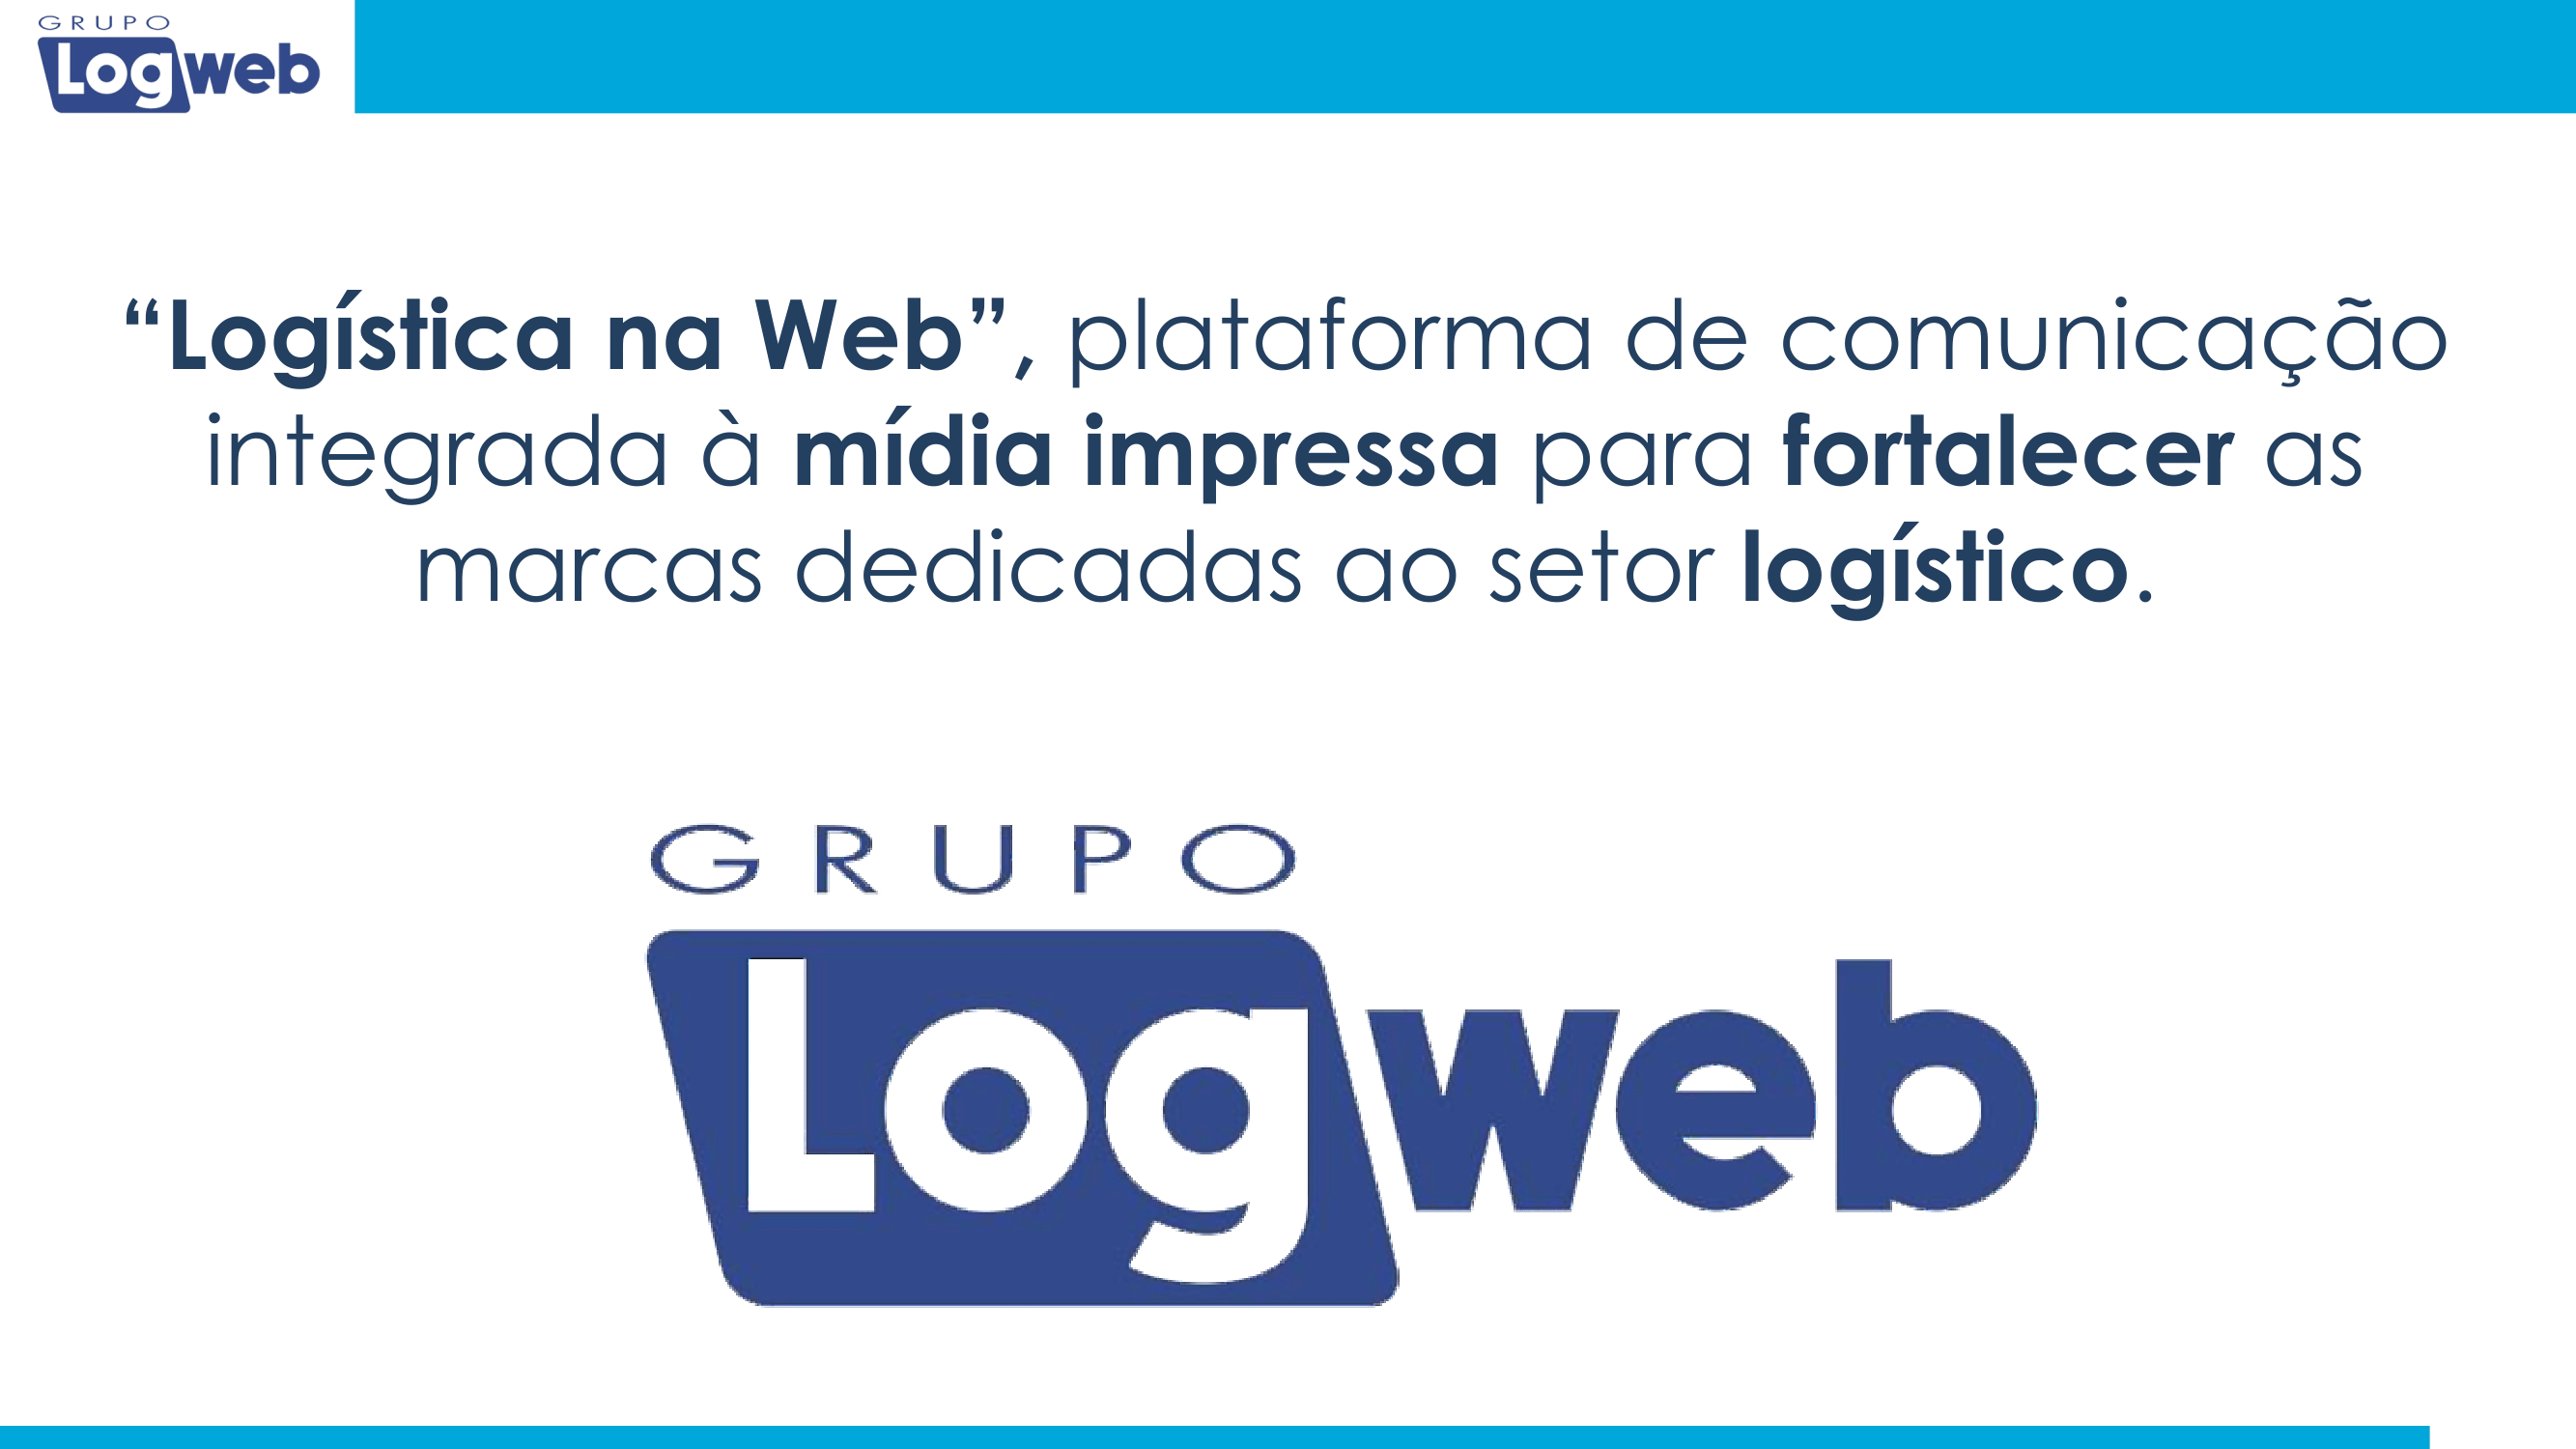 anuncie-logweb-02